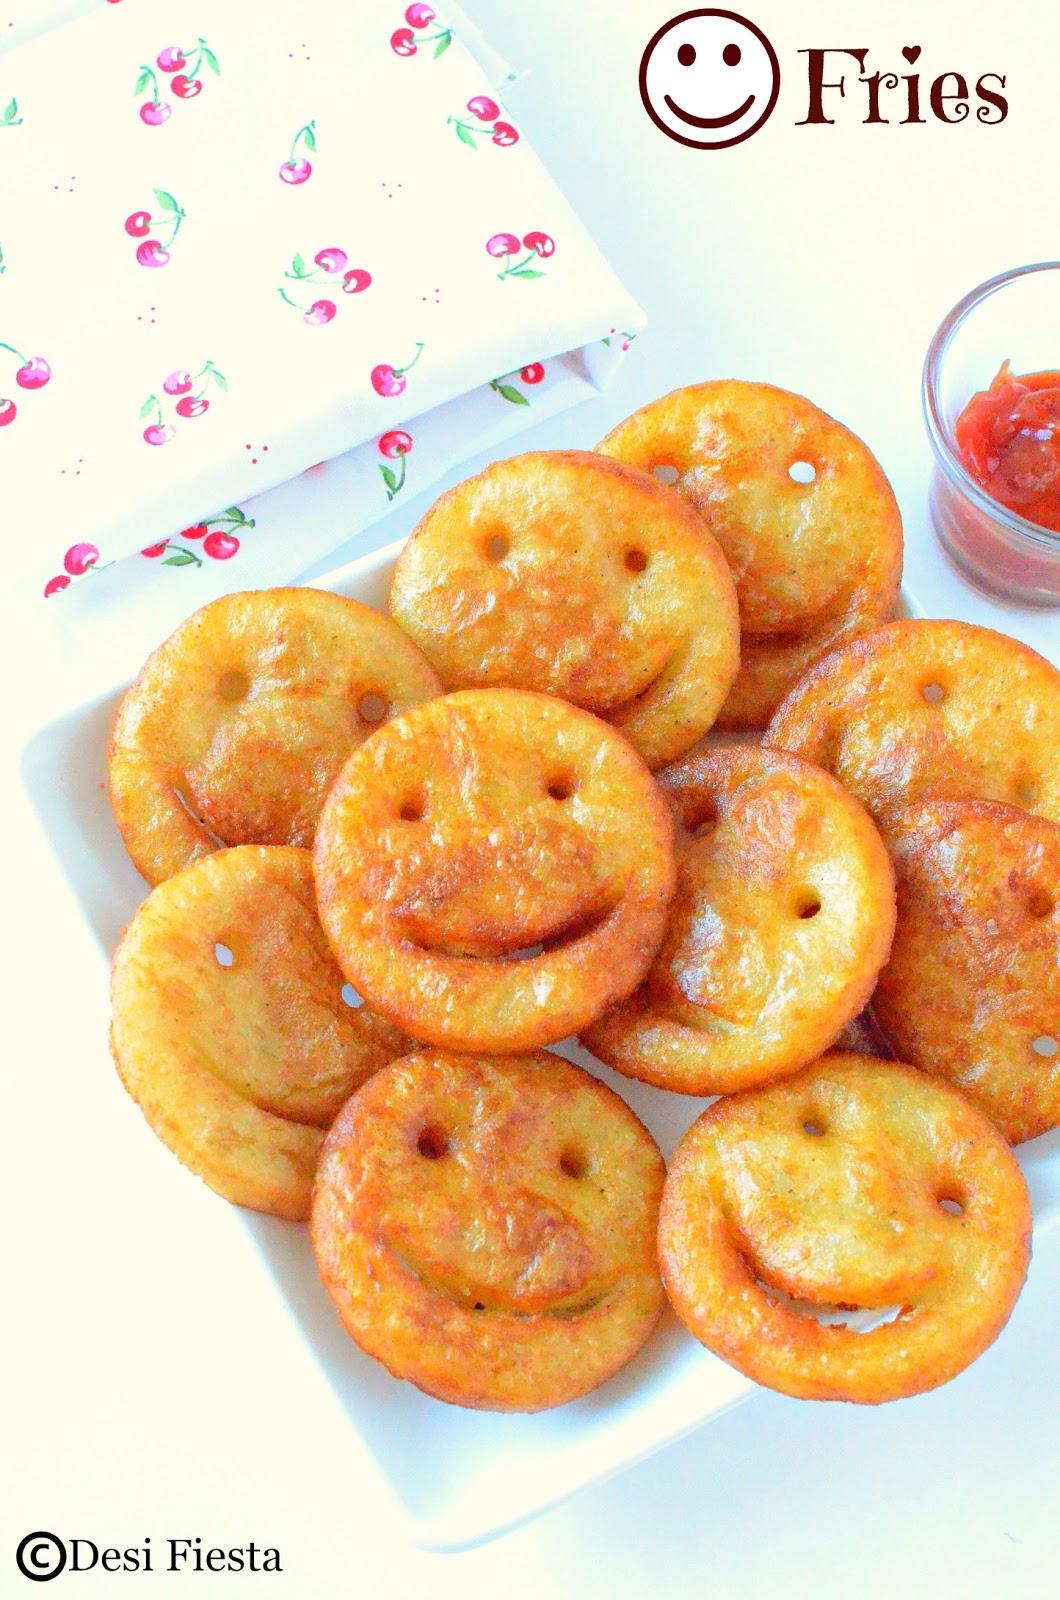 Fried Smiley Potato Fries Recipes